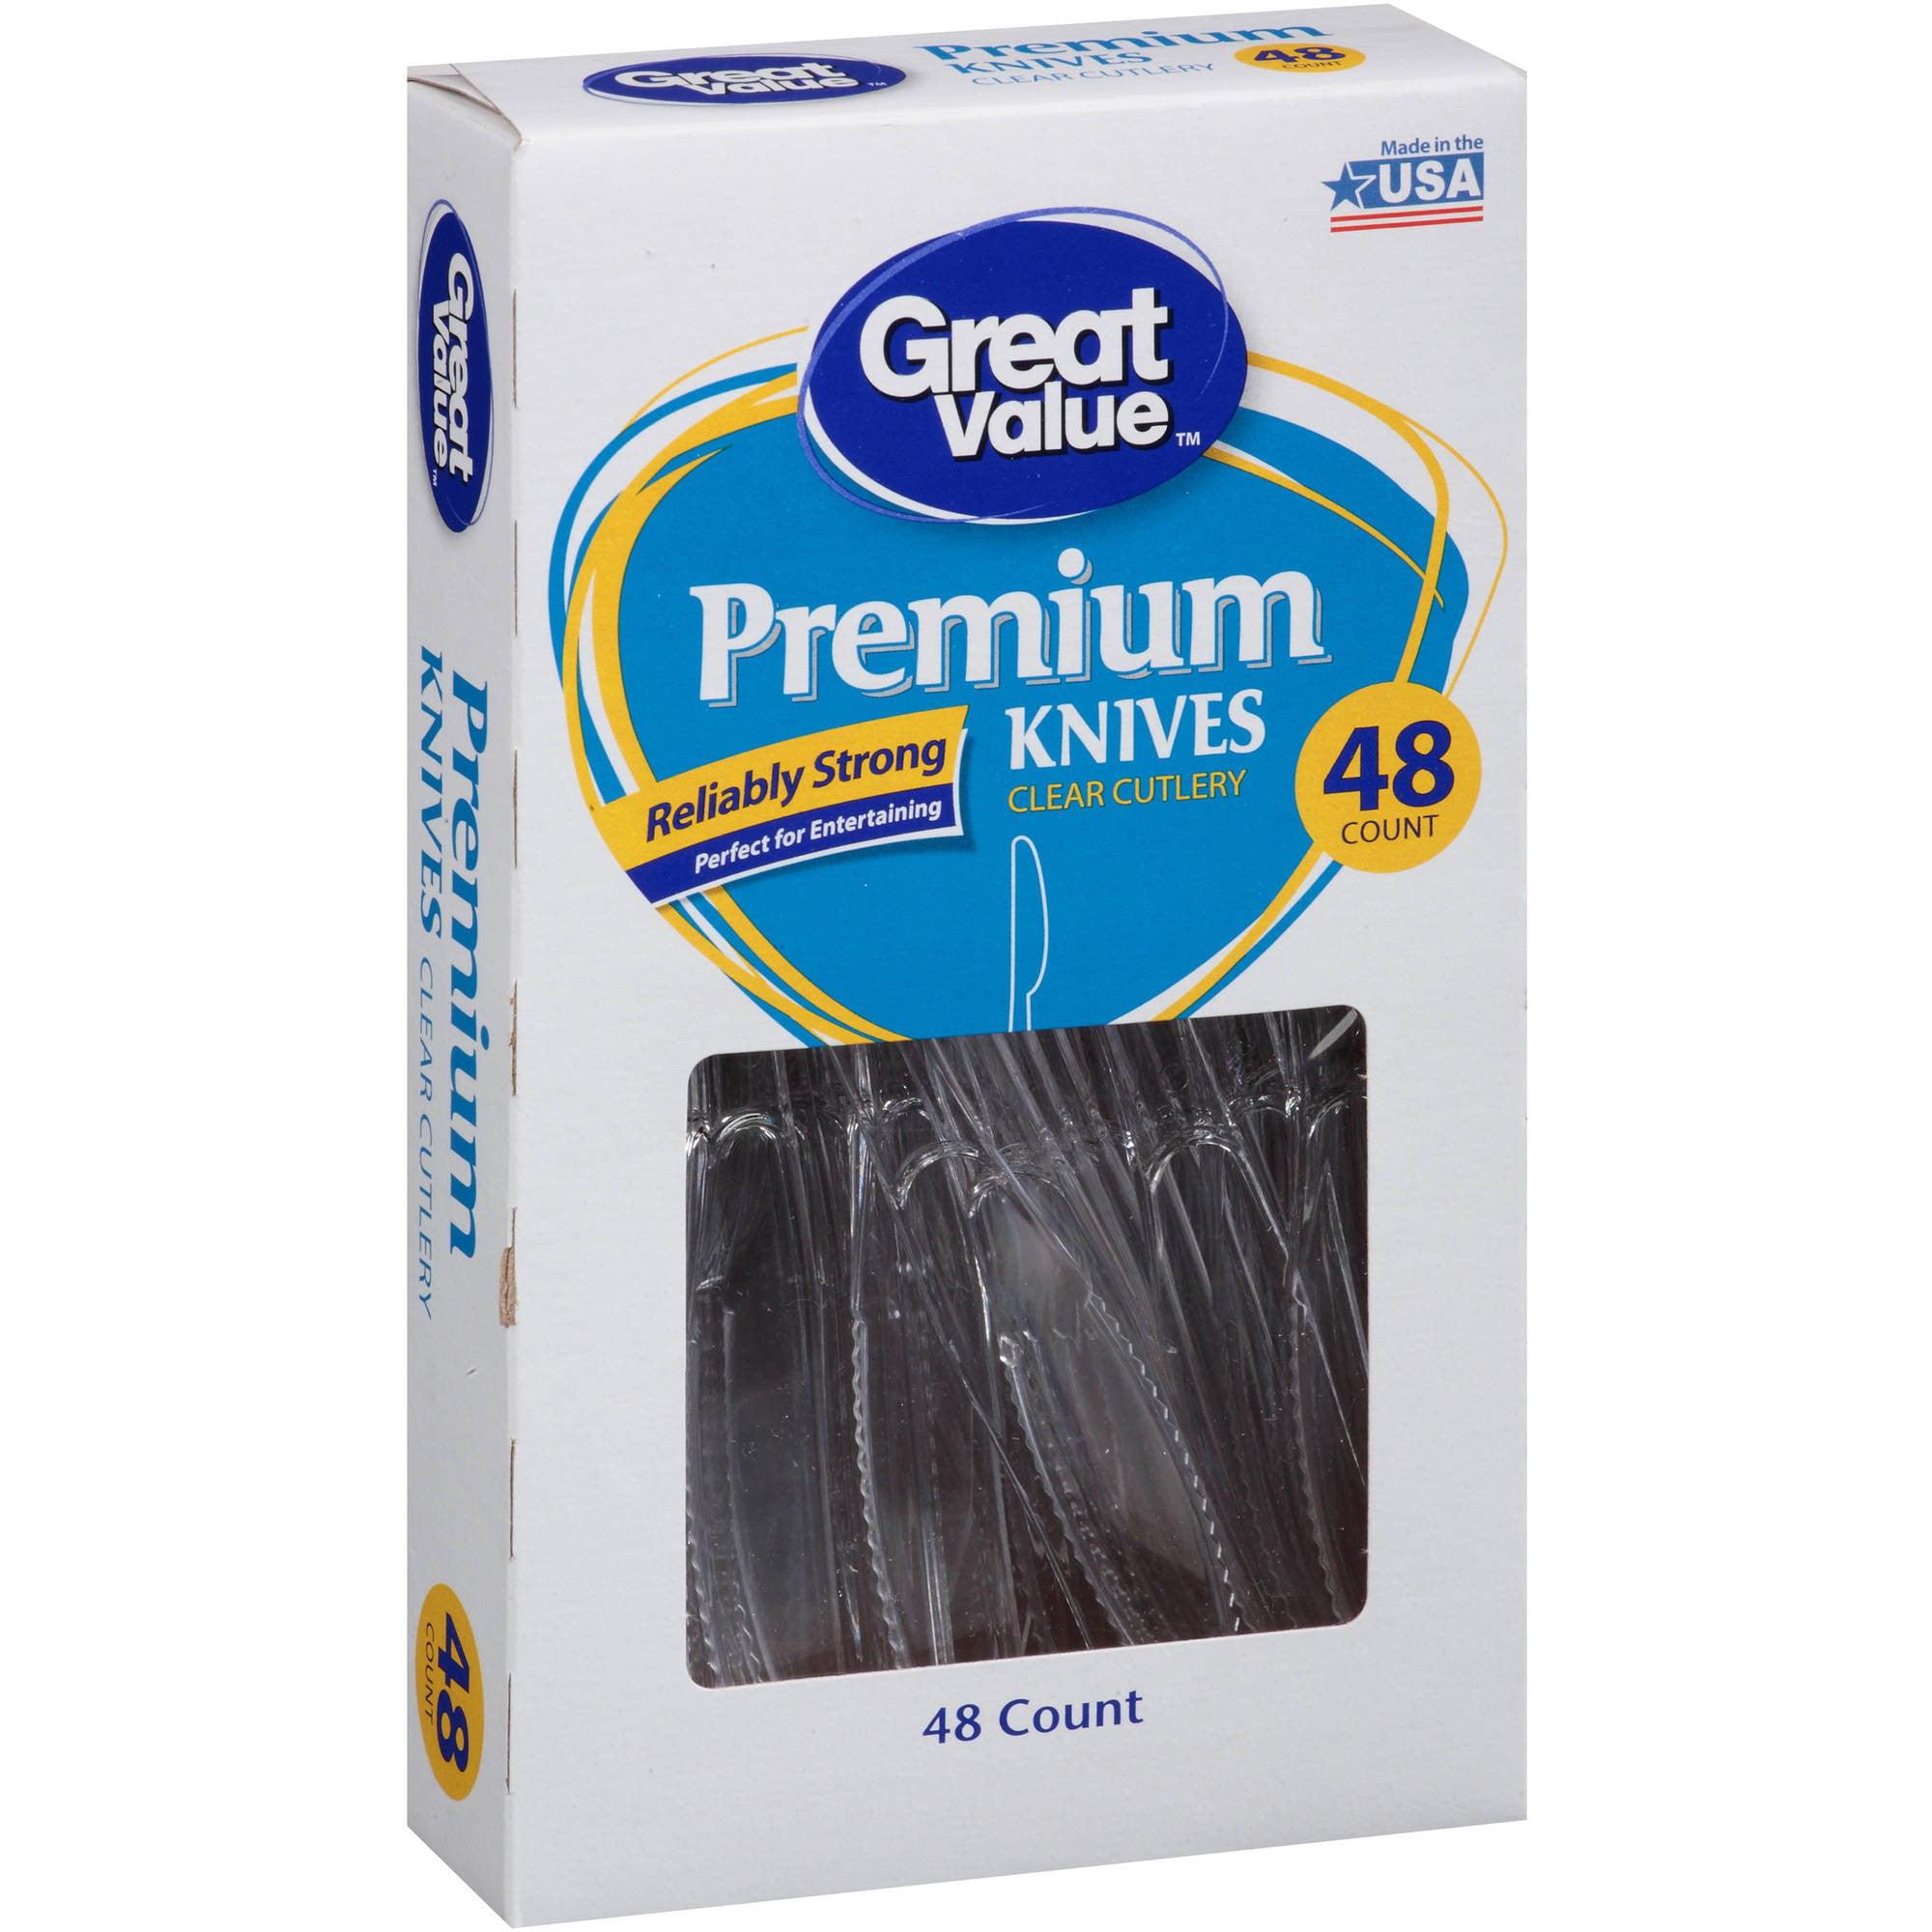 Great Value Premium Knives, 48 Ct